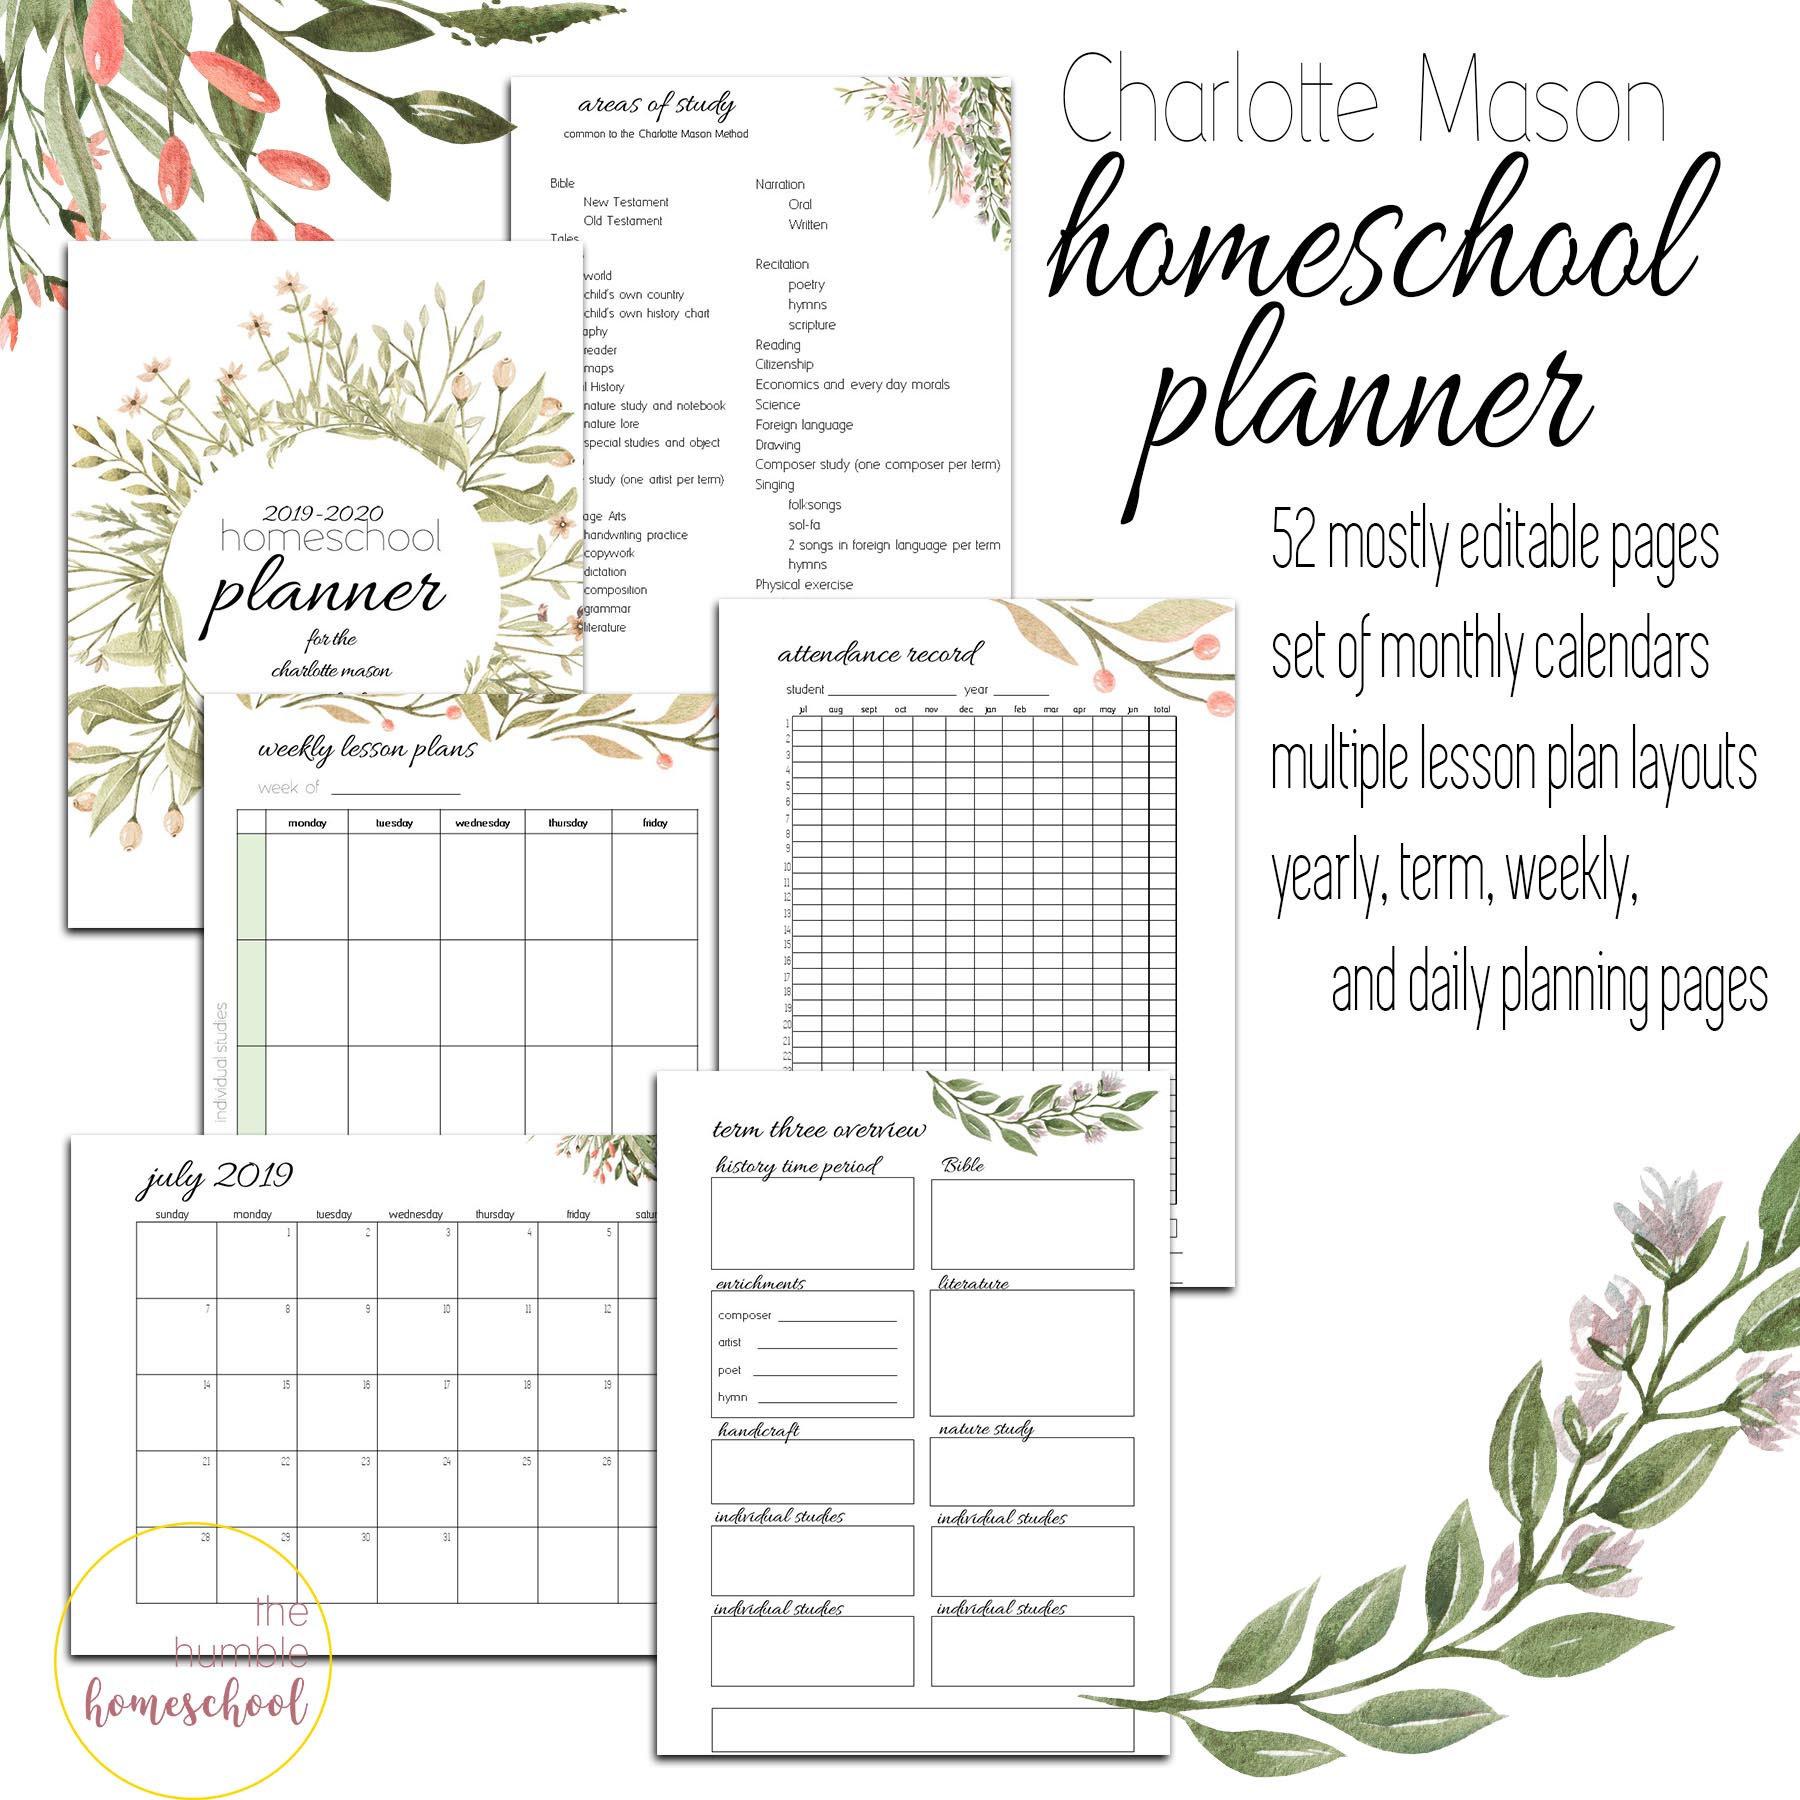 2019-2020 Charlotte Mason Homeschool Planner- Editable Homeschool Planning  Printables throughout Homeschool Year At A Glance 2019-2020 Botanical Calendar Printable Free